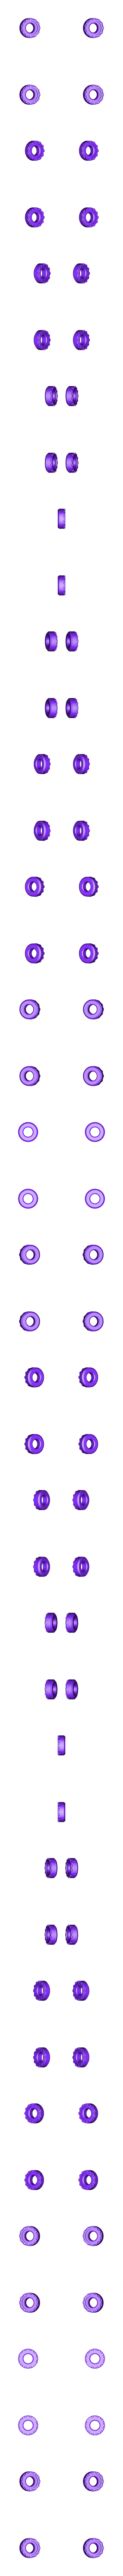 SmallToys-GearsType1.stl Download STL file SmallToys - Cars pack • 3D print design, Wabby